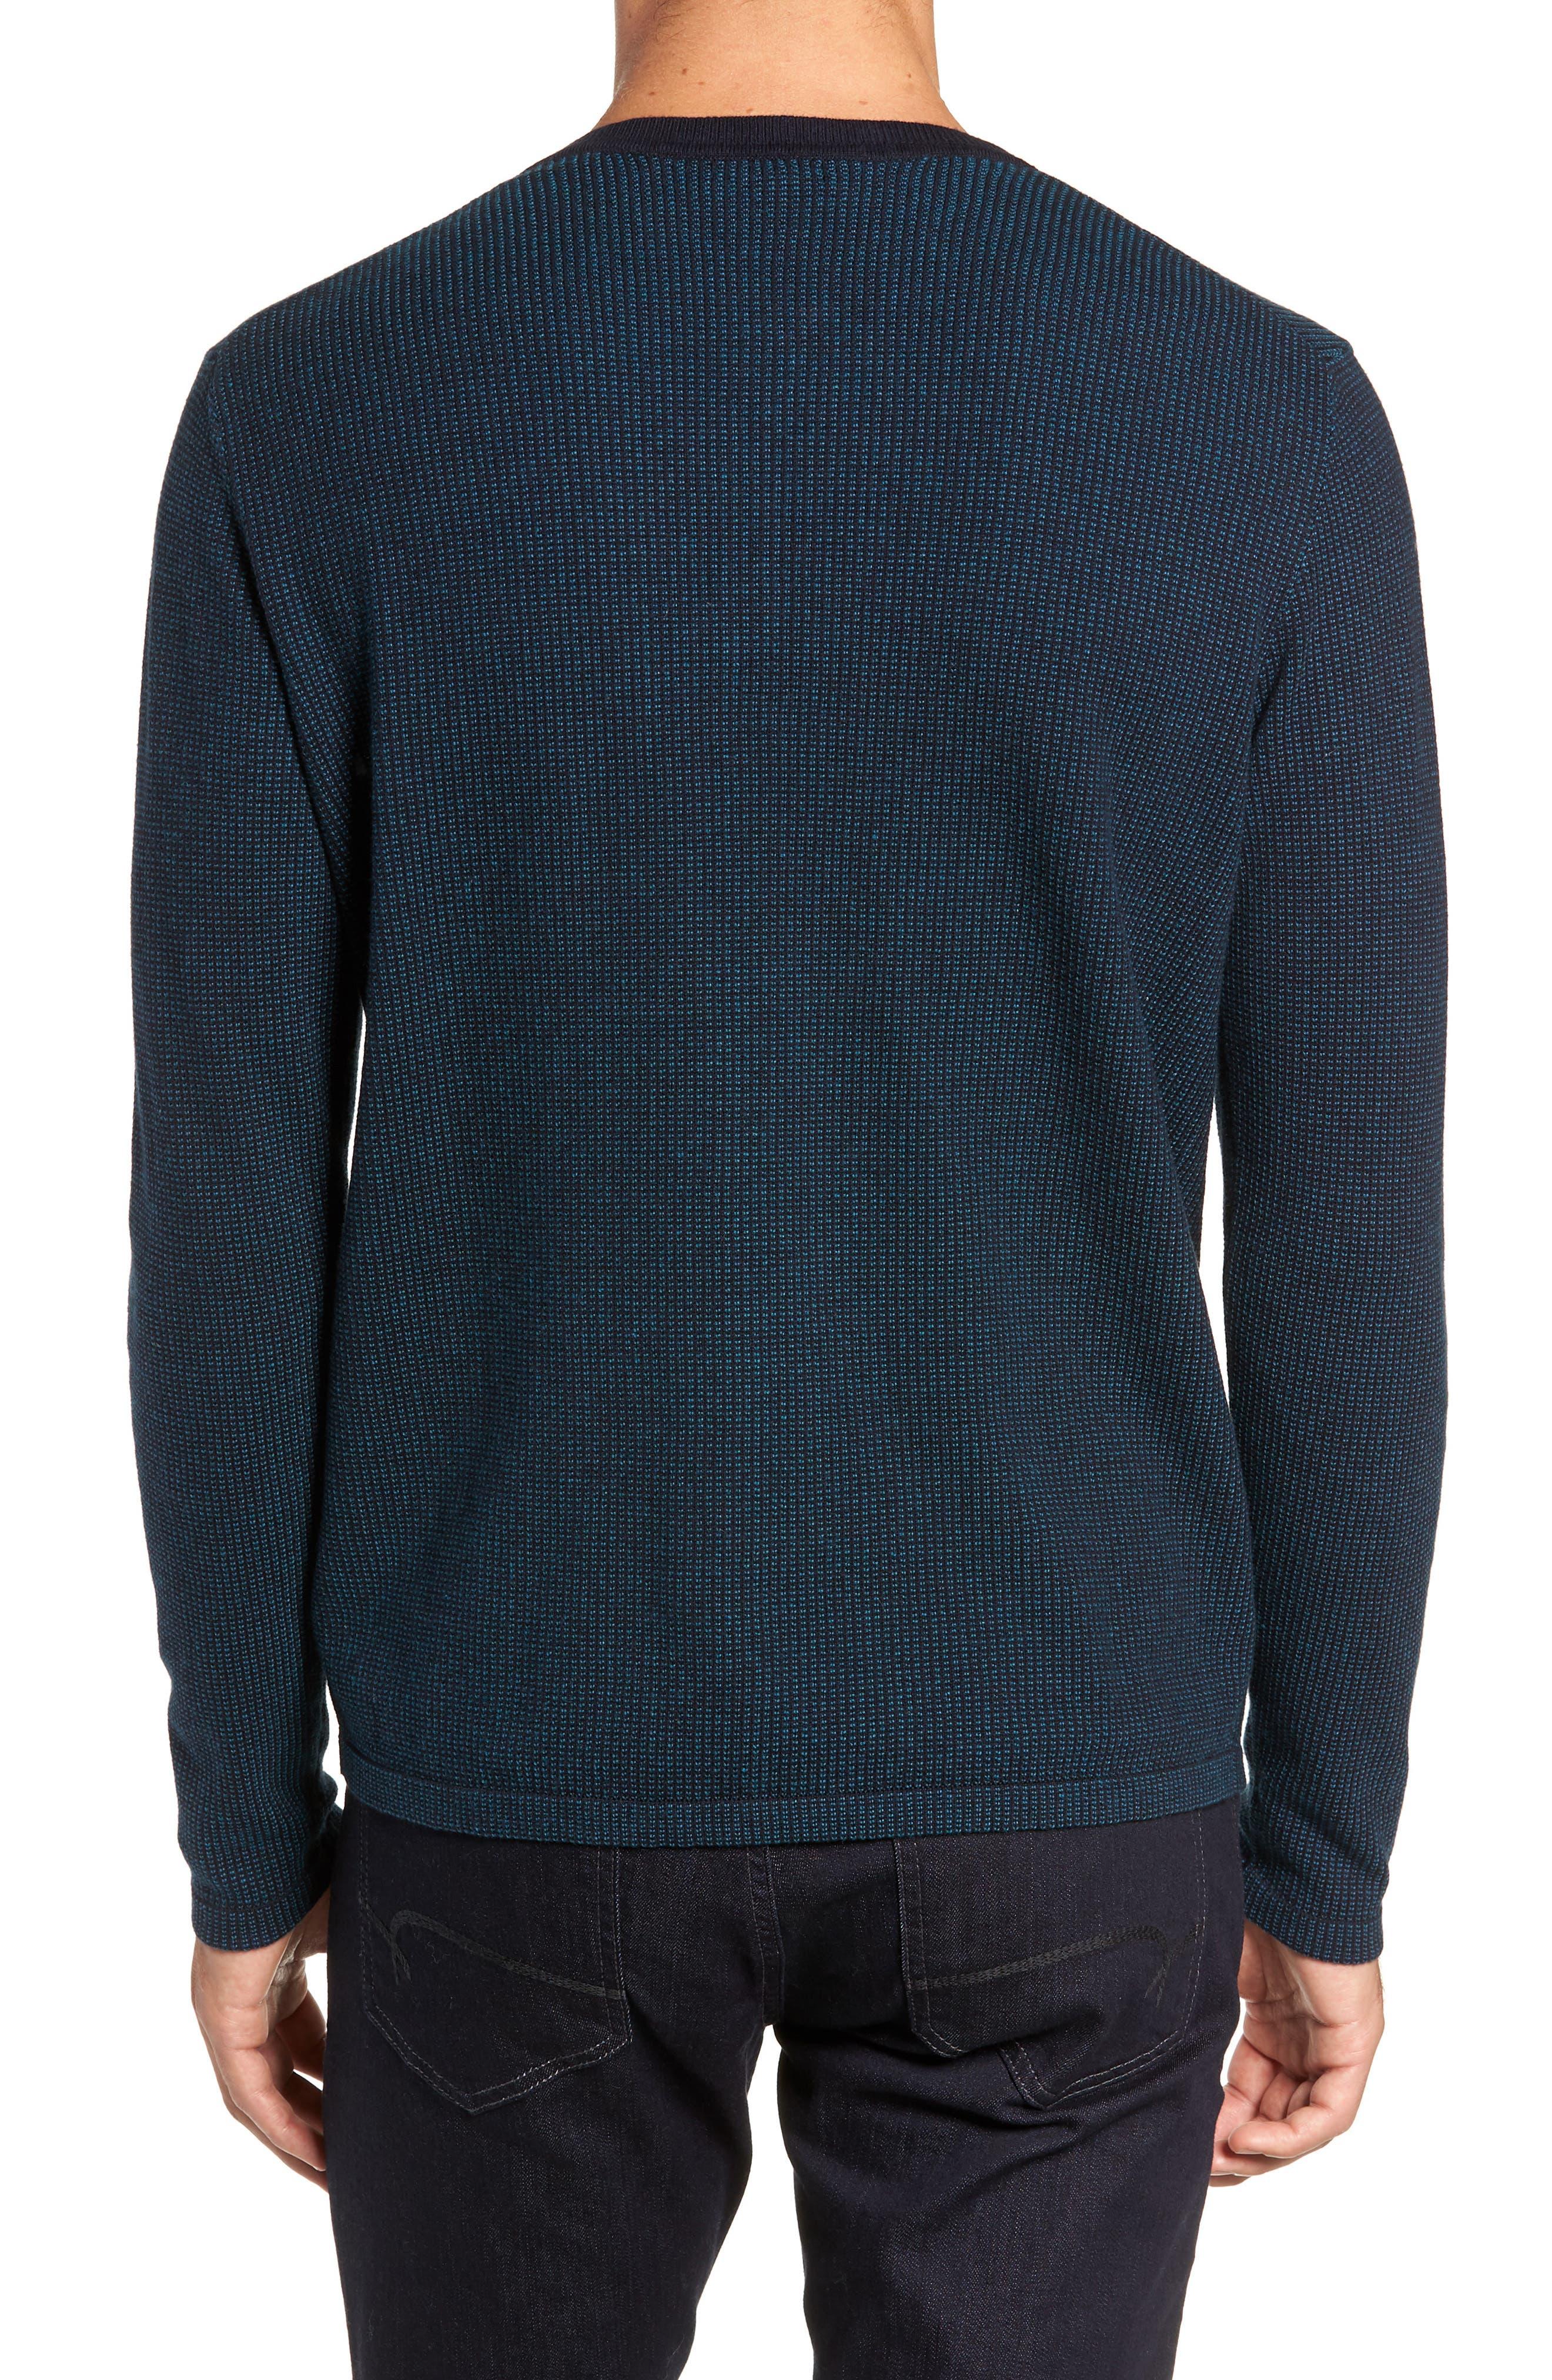 ZACHARY PRELL, Kimball Henley Sweater, Alternate thumbnail 2, color, EMERALD